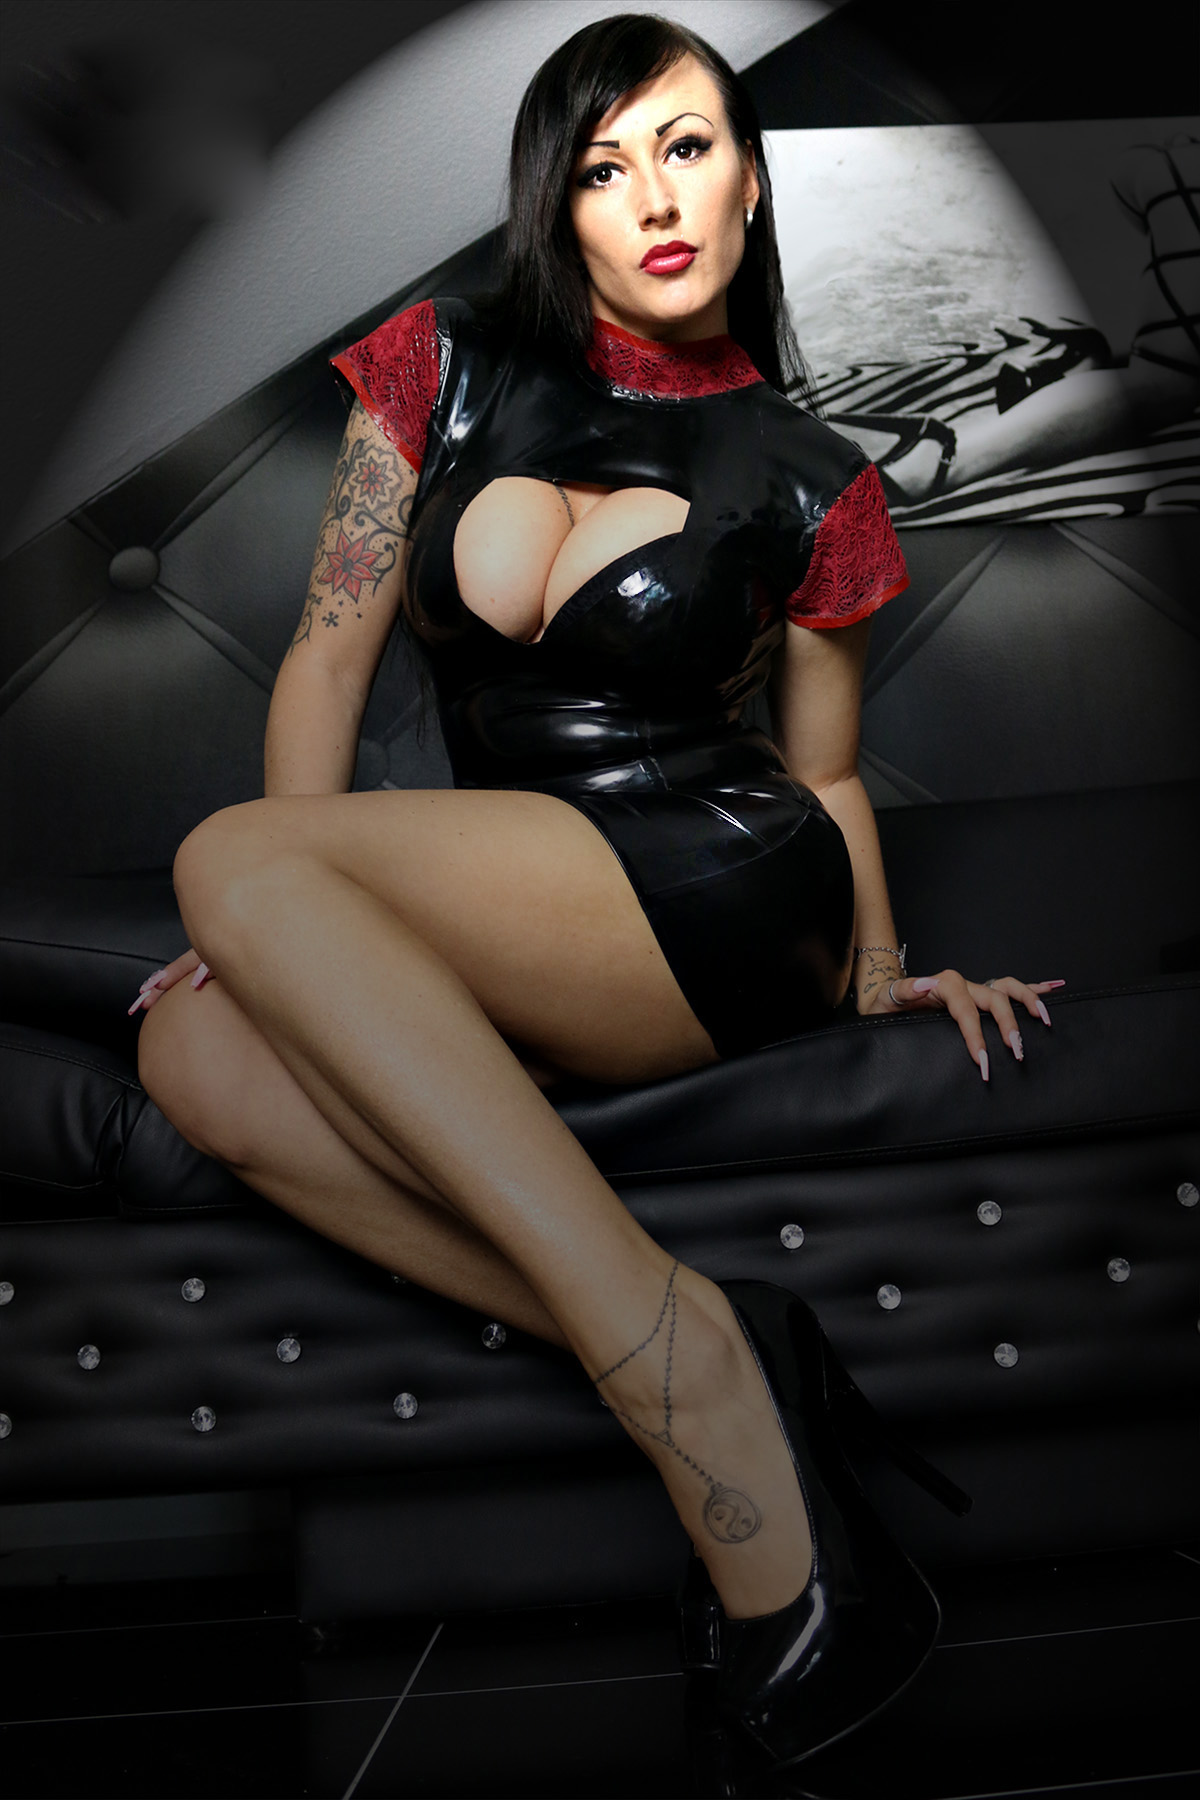 Latex Dress Sexy Lady Love